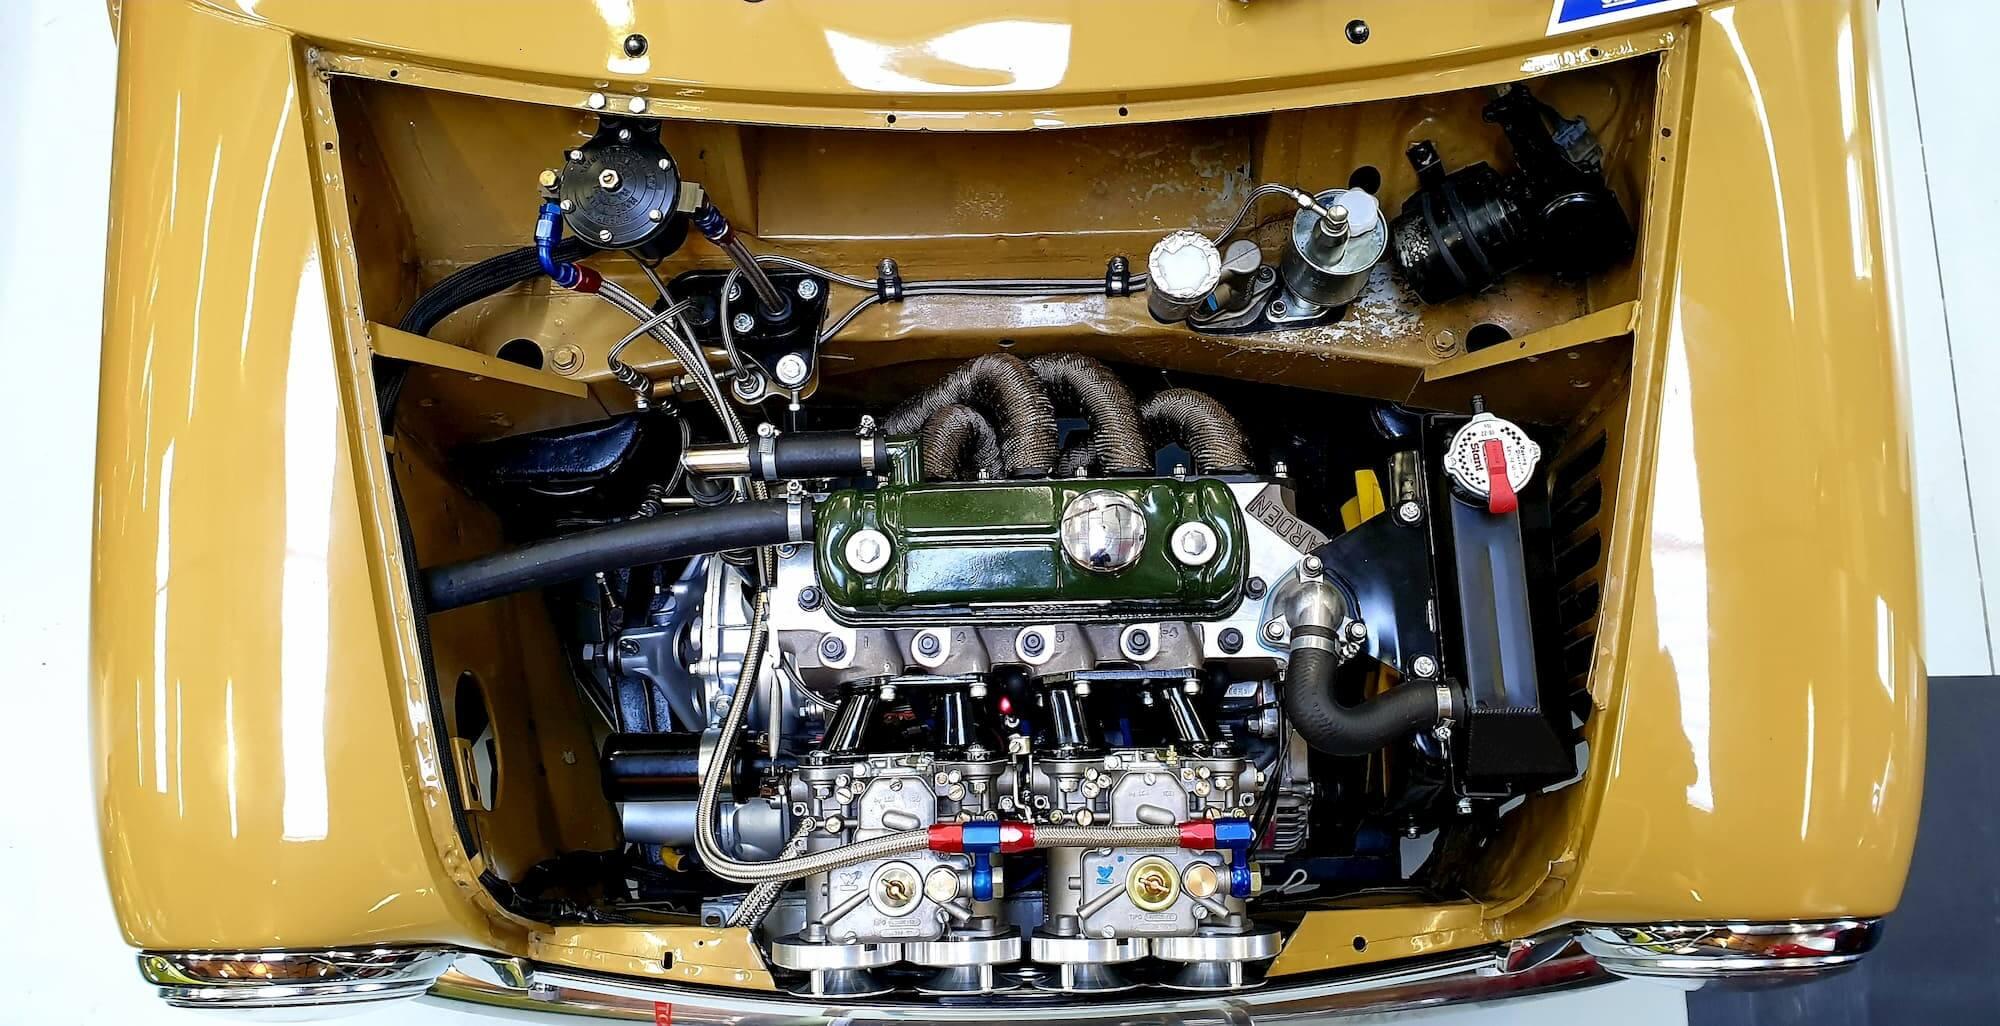 Moteur Austin Mini 1293cc MK2 - Culasse Arden - Twin weber